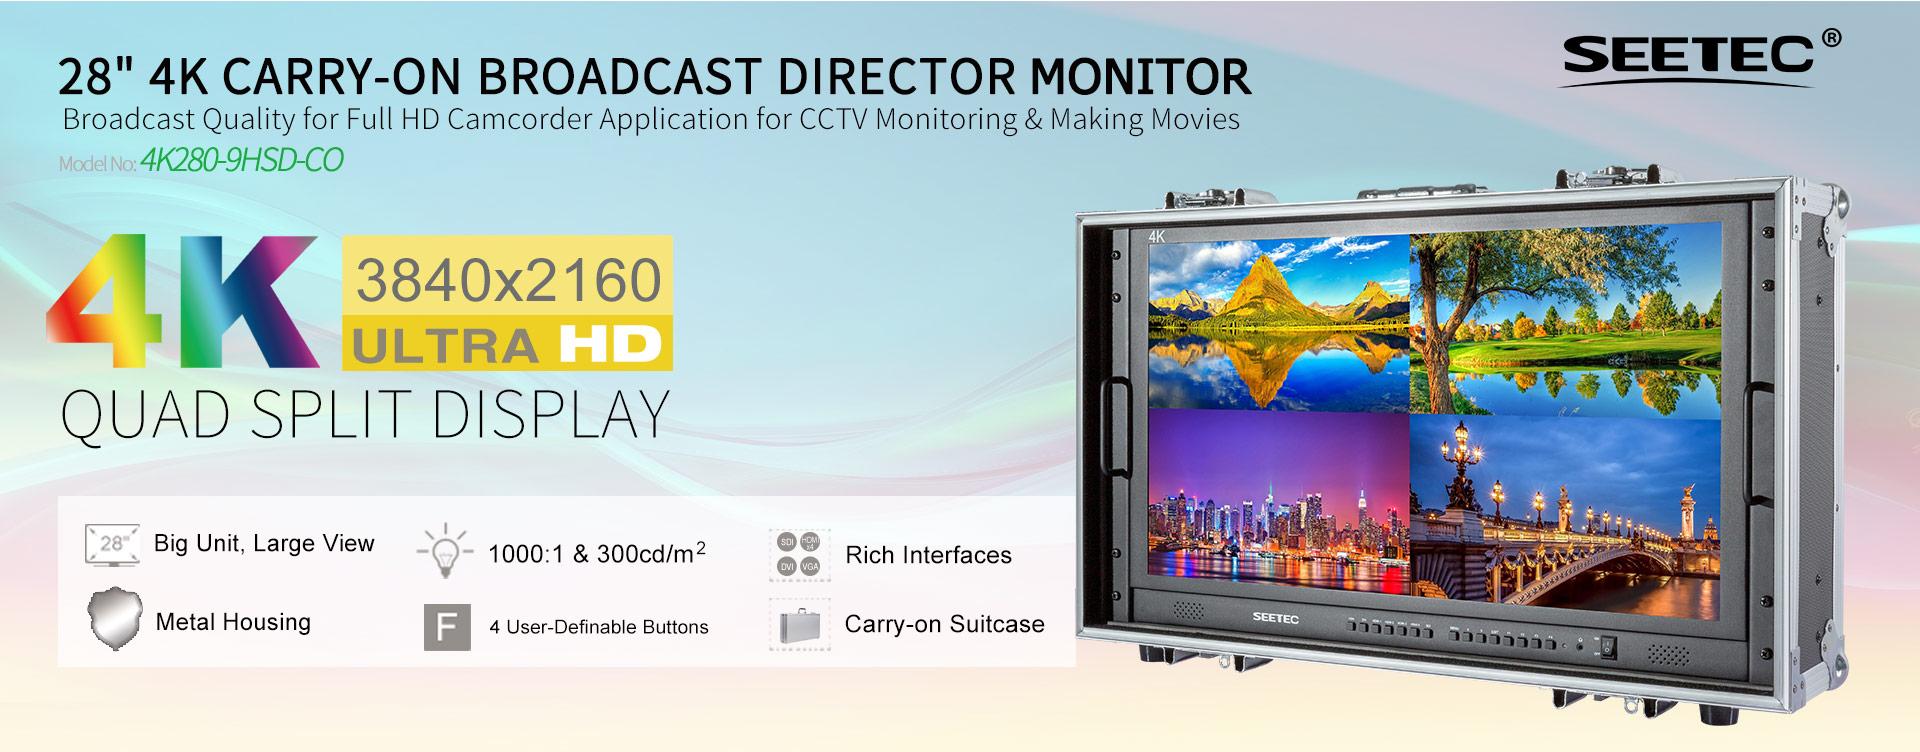 4k-monitor-resolution